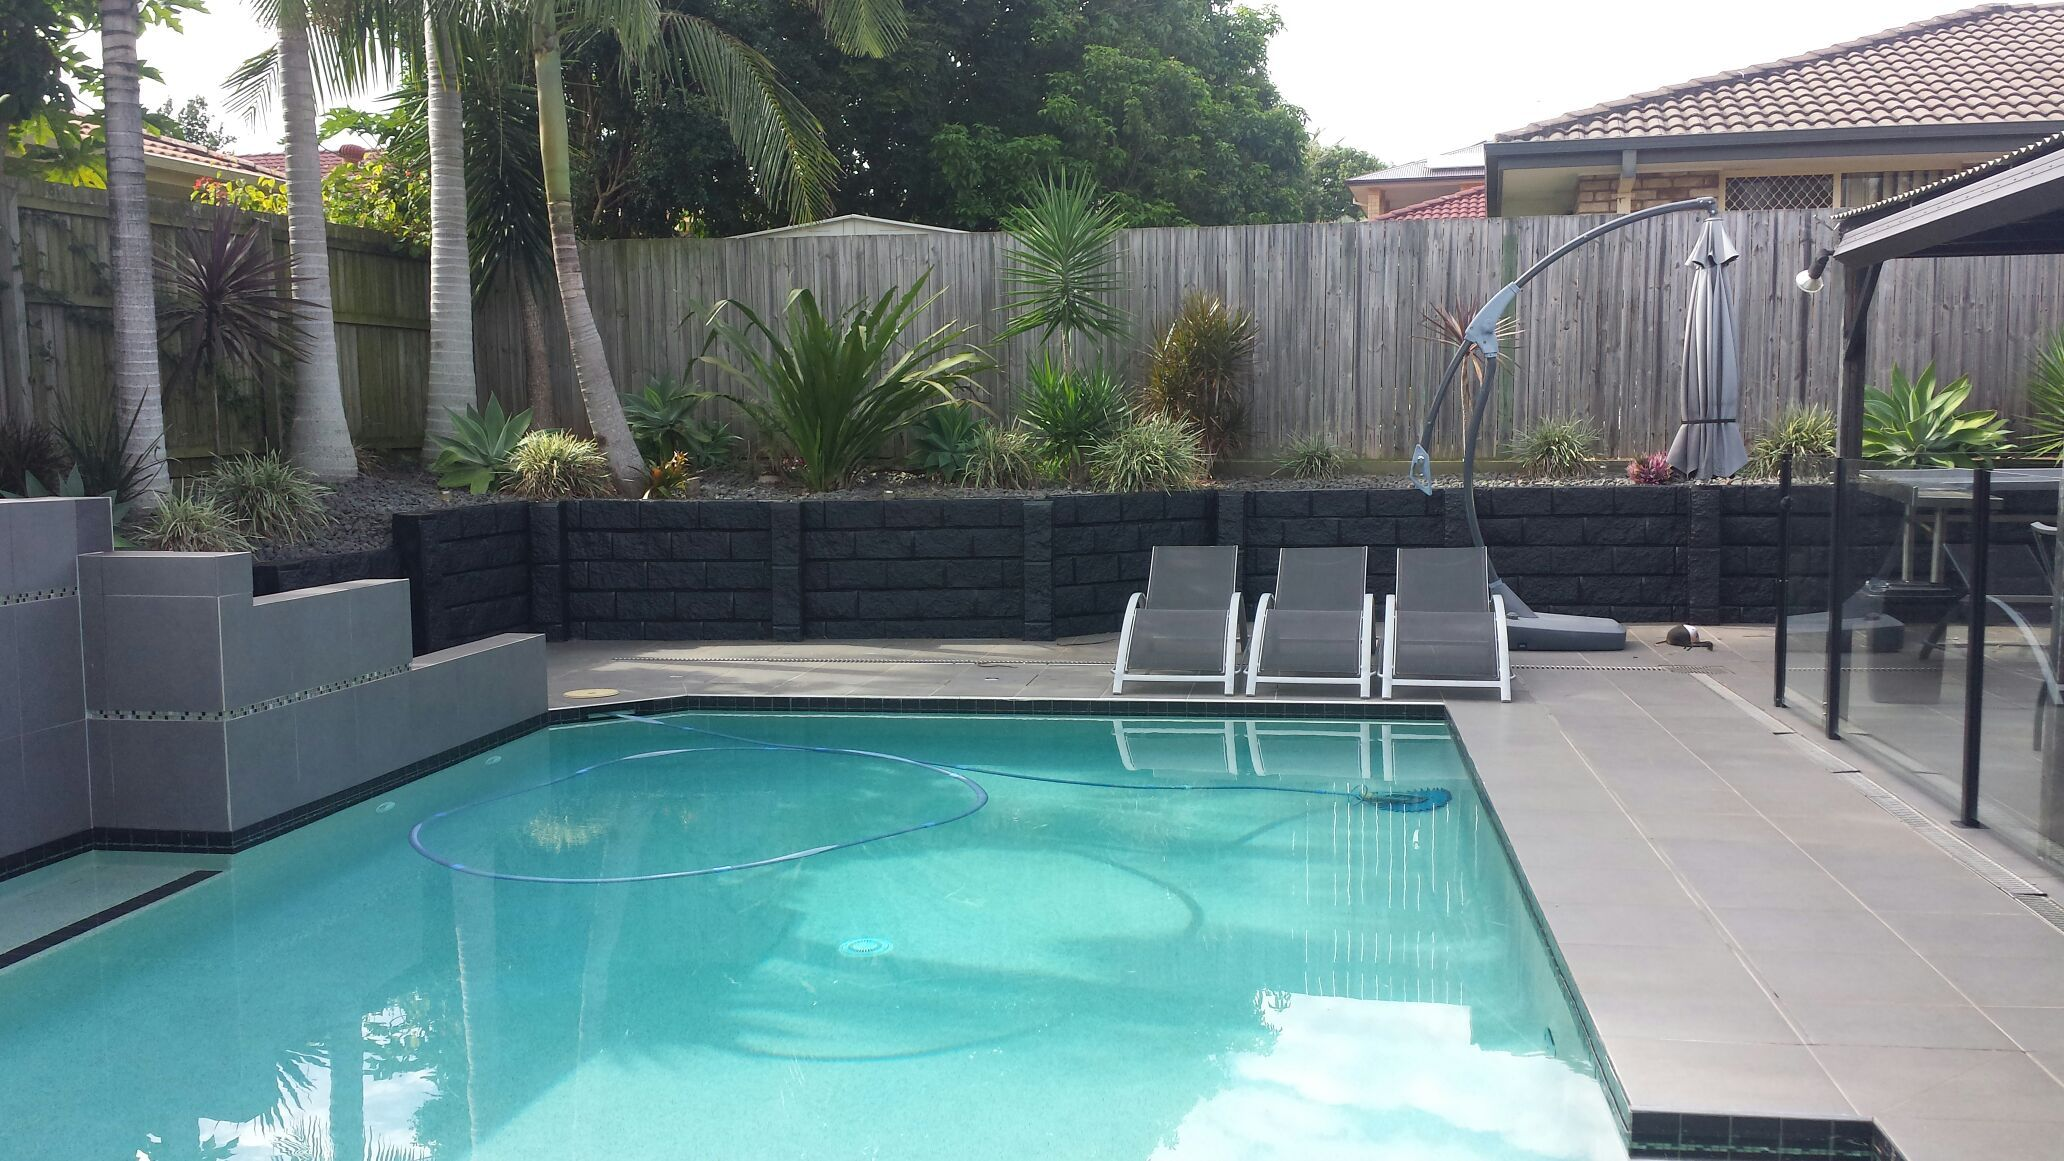 Sandstone Effect Concrete Sleepers Posts Sealed With Black Sealant Dream Backyard Dream Pools Backyard